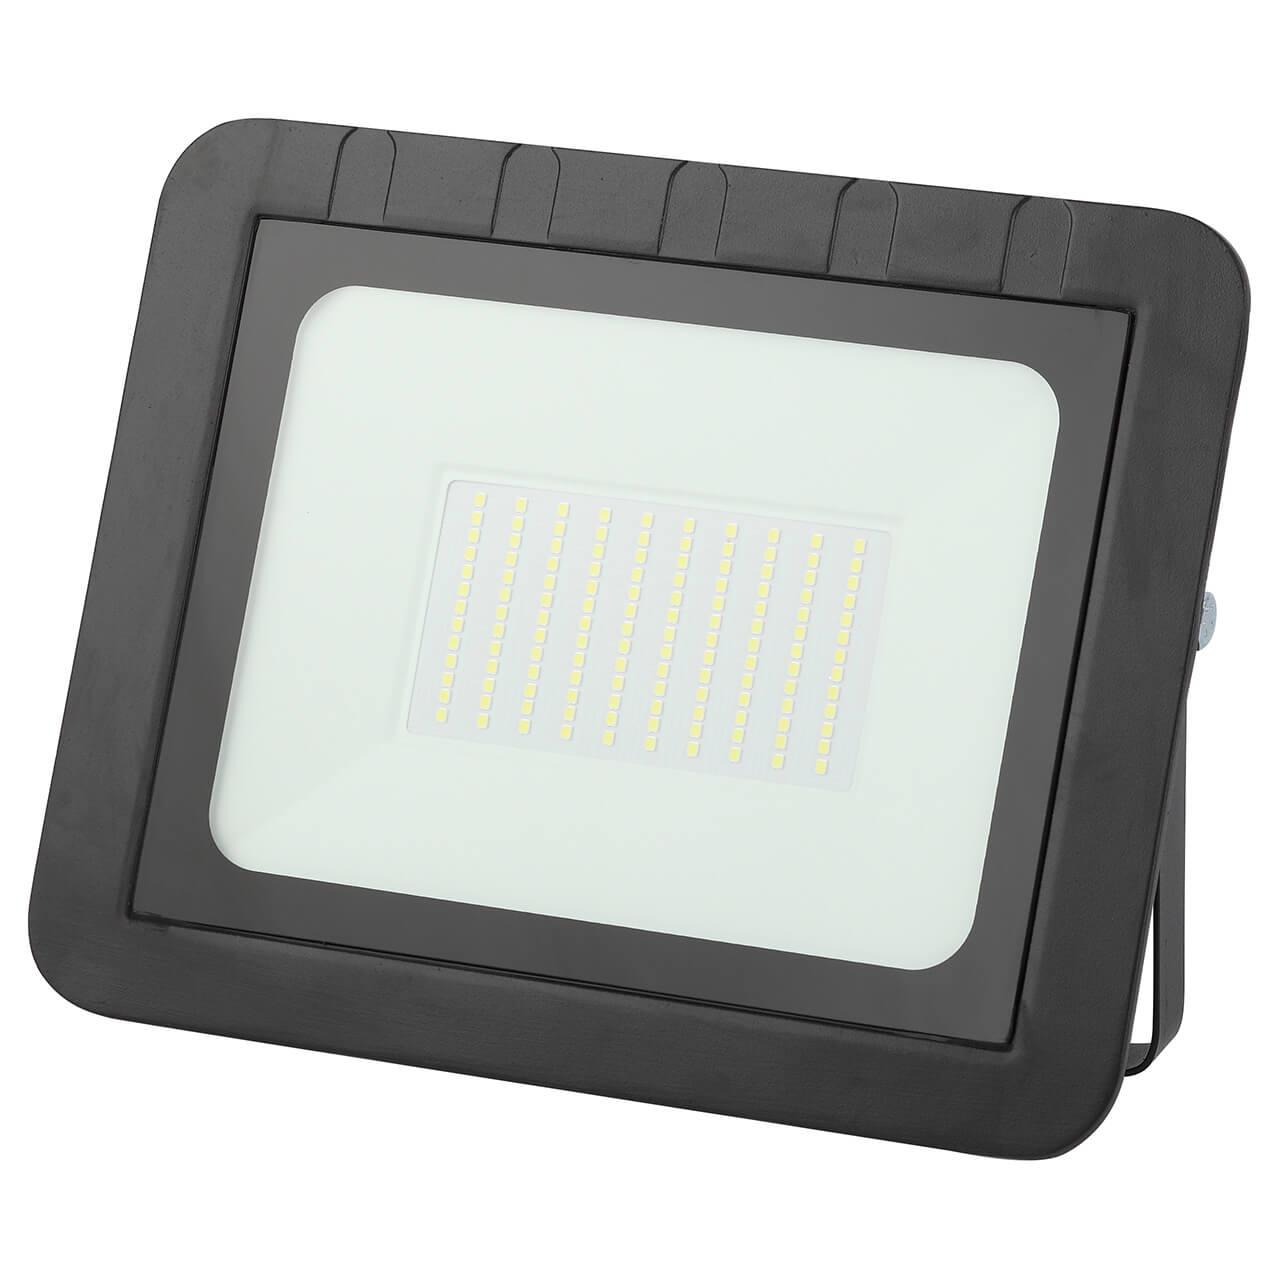 Прожектор ЭРА PRO LPR-061-0-65K-200 LPR-061